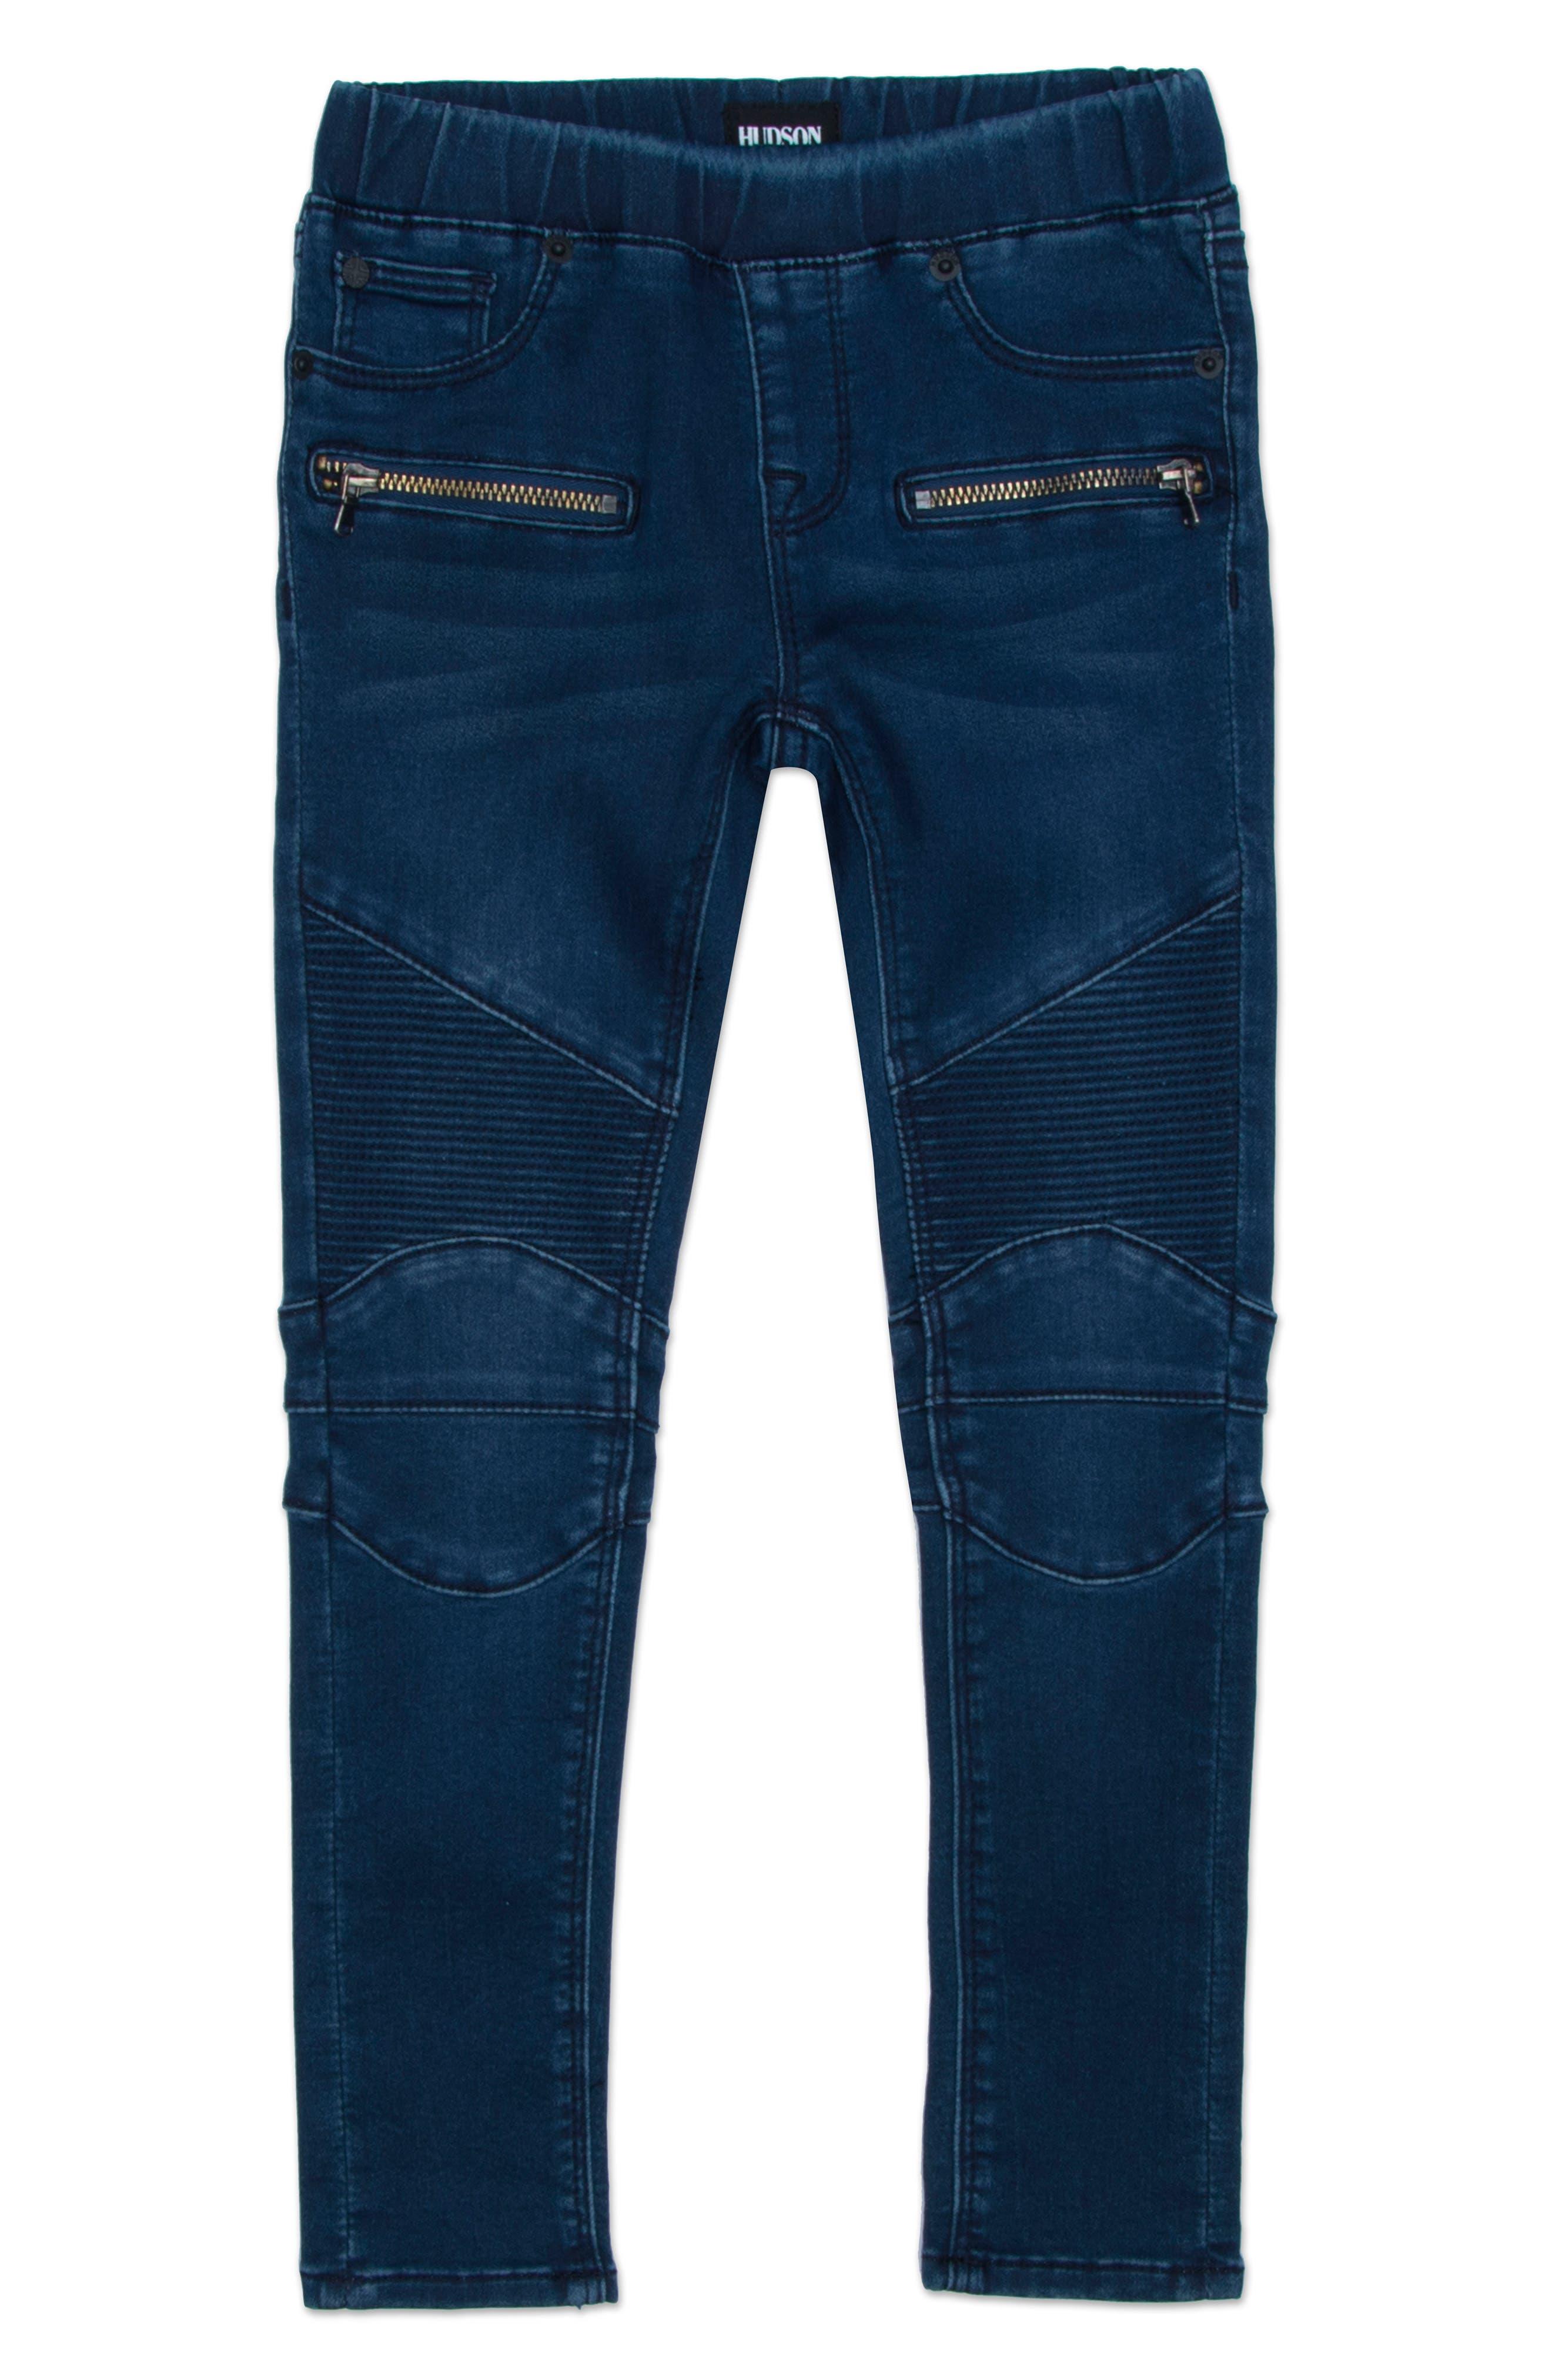 Moto Skinny Jeans,                             Main thumbnail 1, color,                             Nile